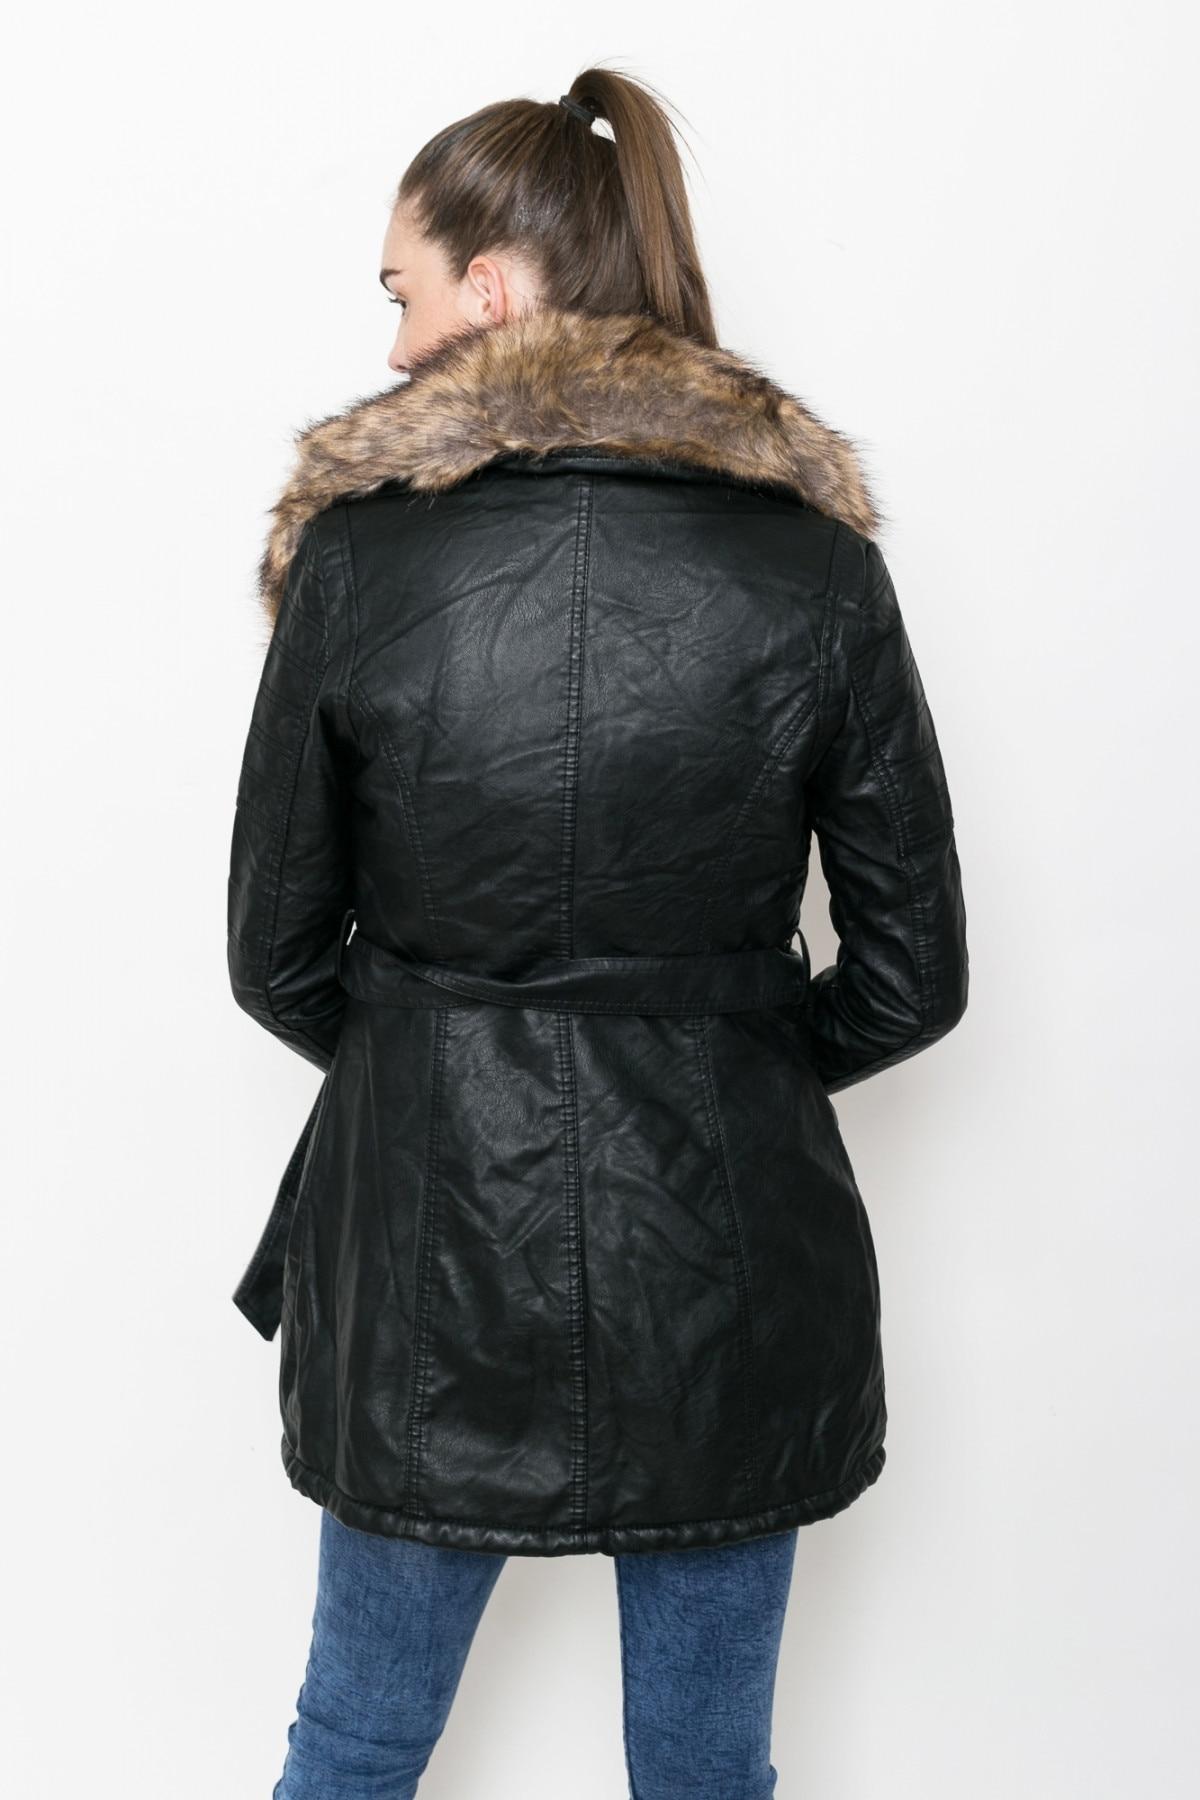 Női kabát Stradivarius, fekete, méret S eMAG.hu